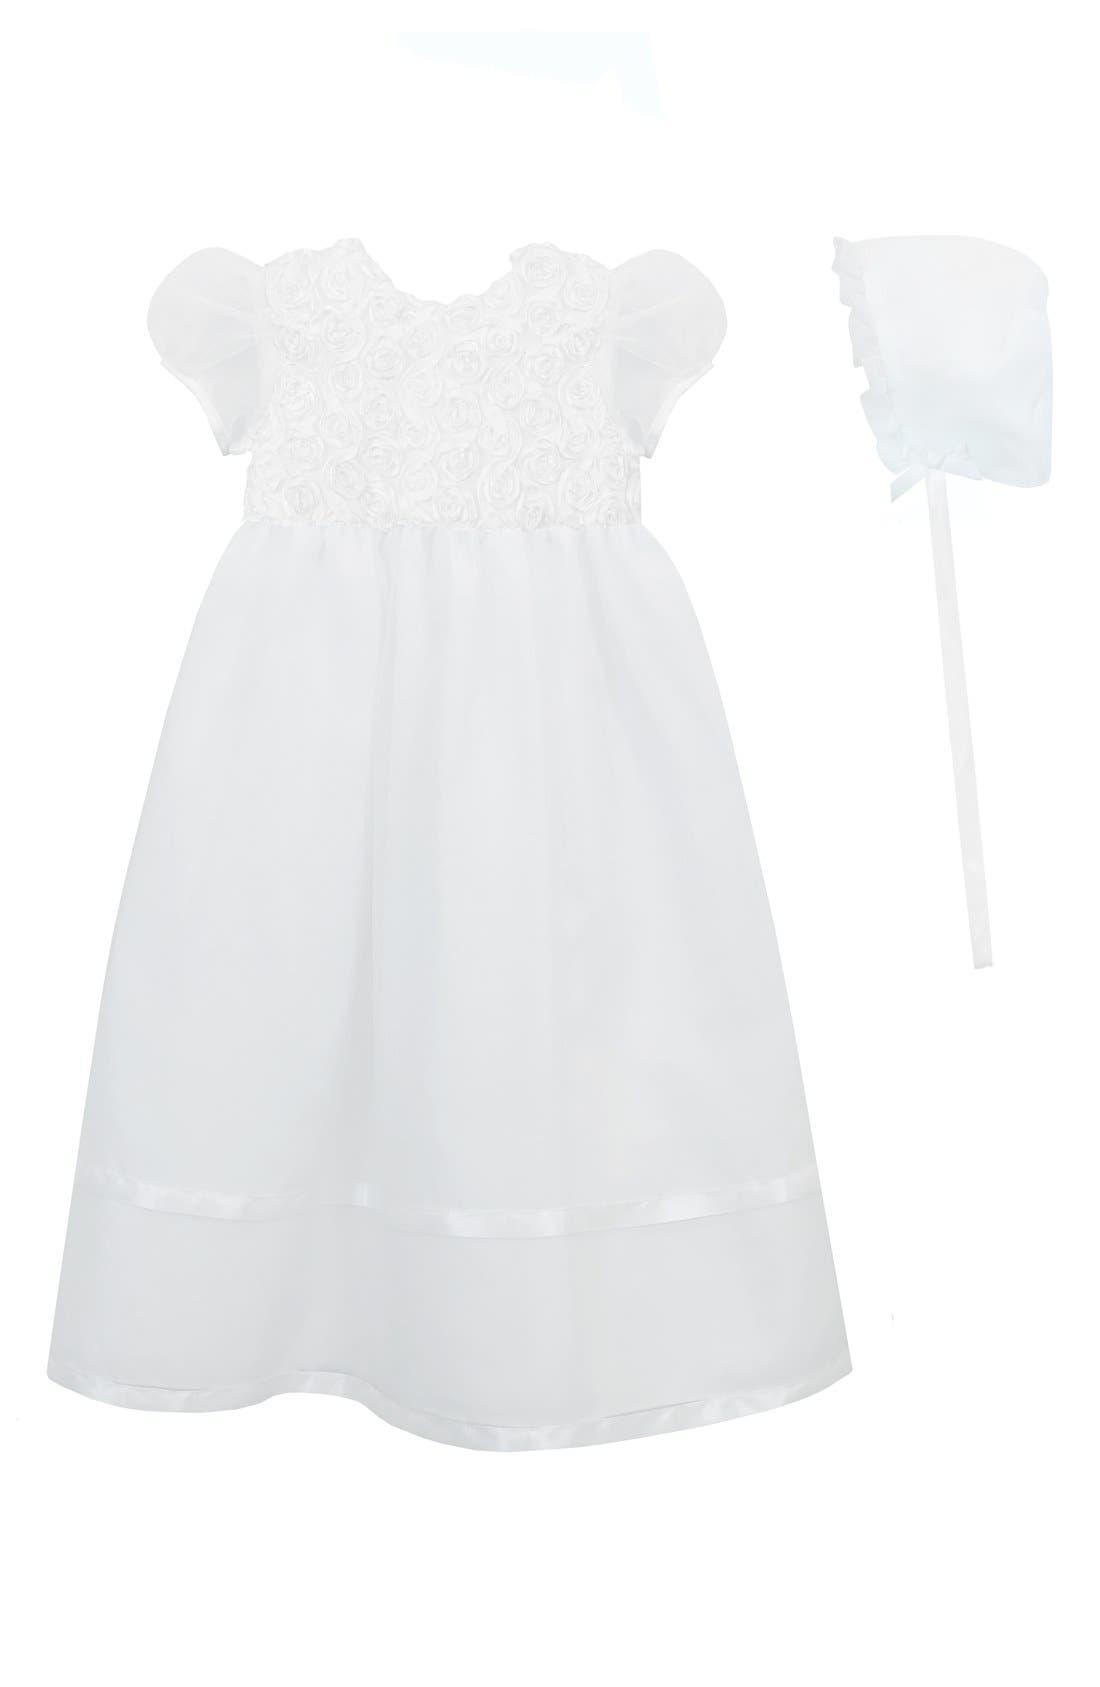 Christening Gown & Bonnet,                         Main,                         color, White